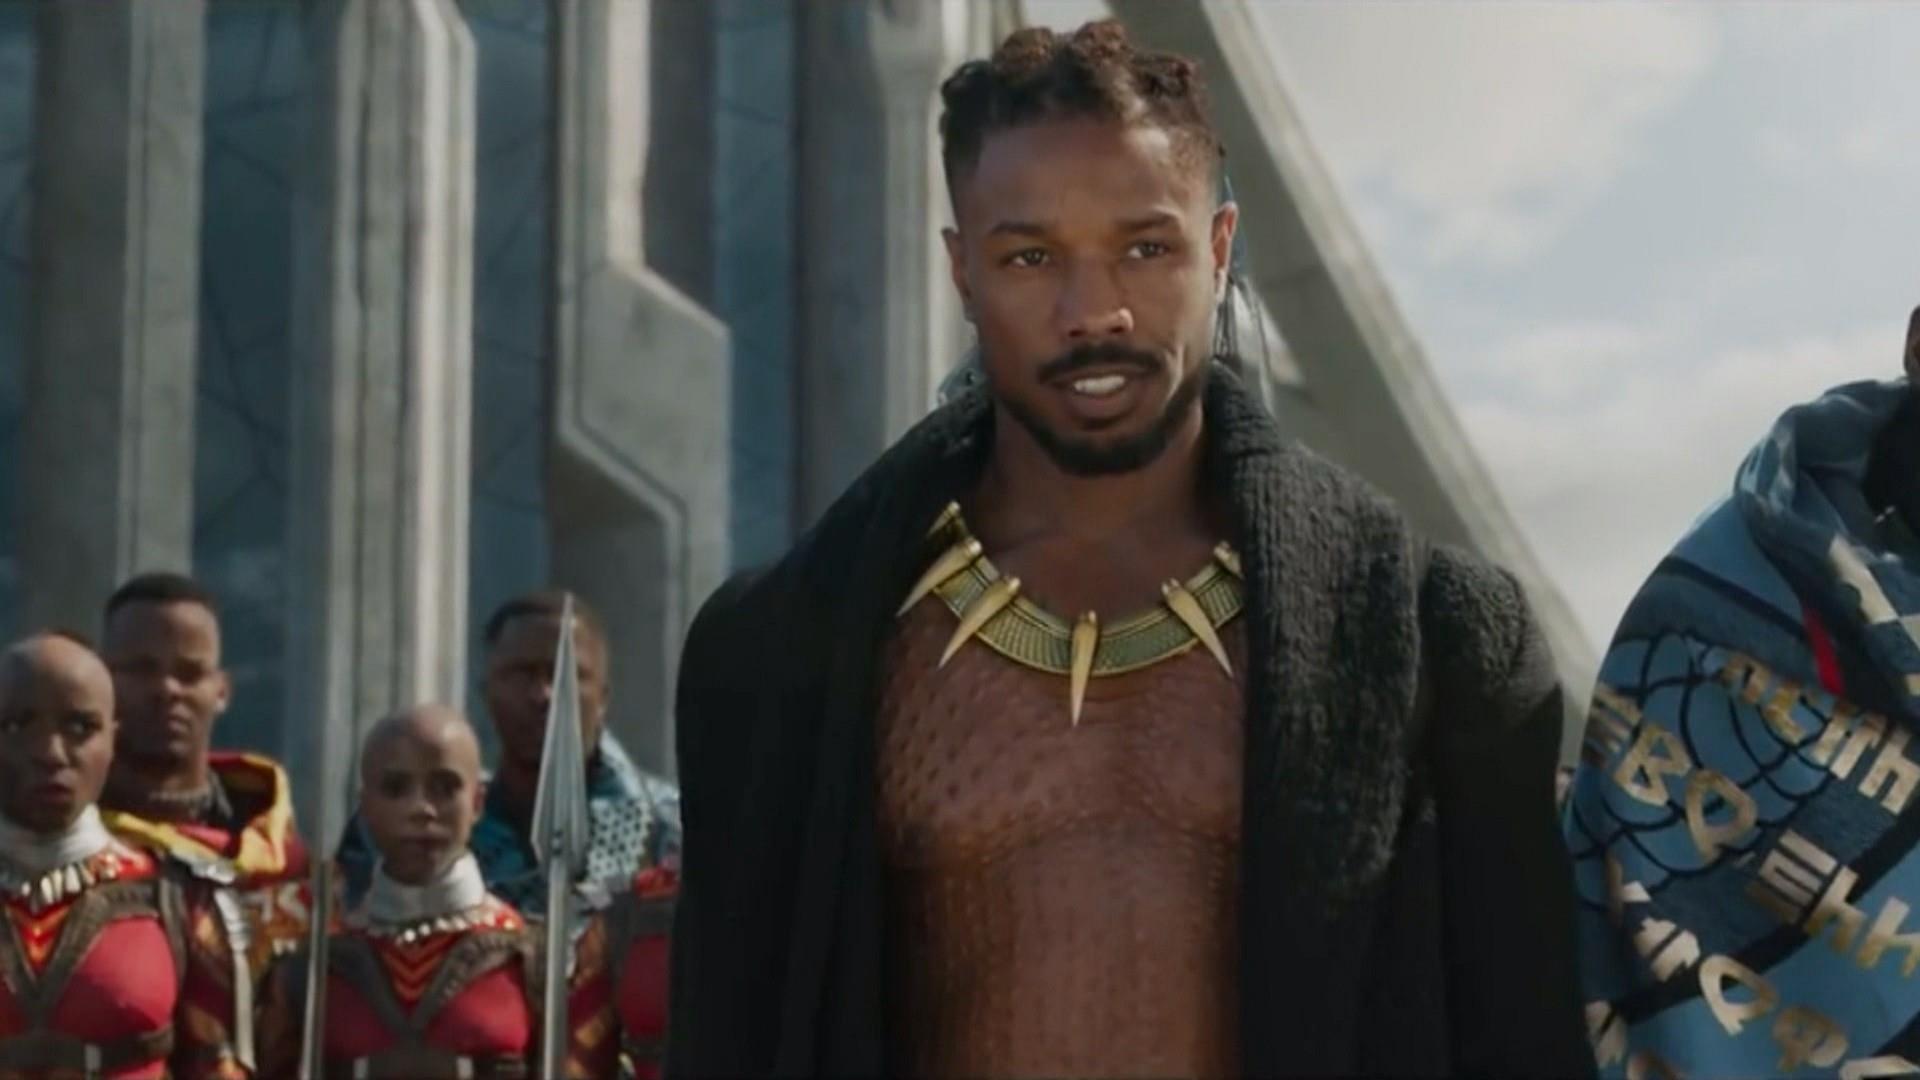 Black Panther Star Michael B Jordan Reaches Out To Teen